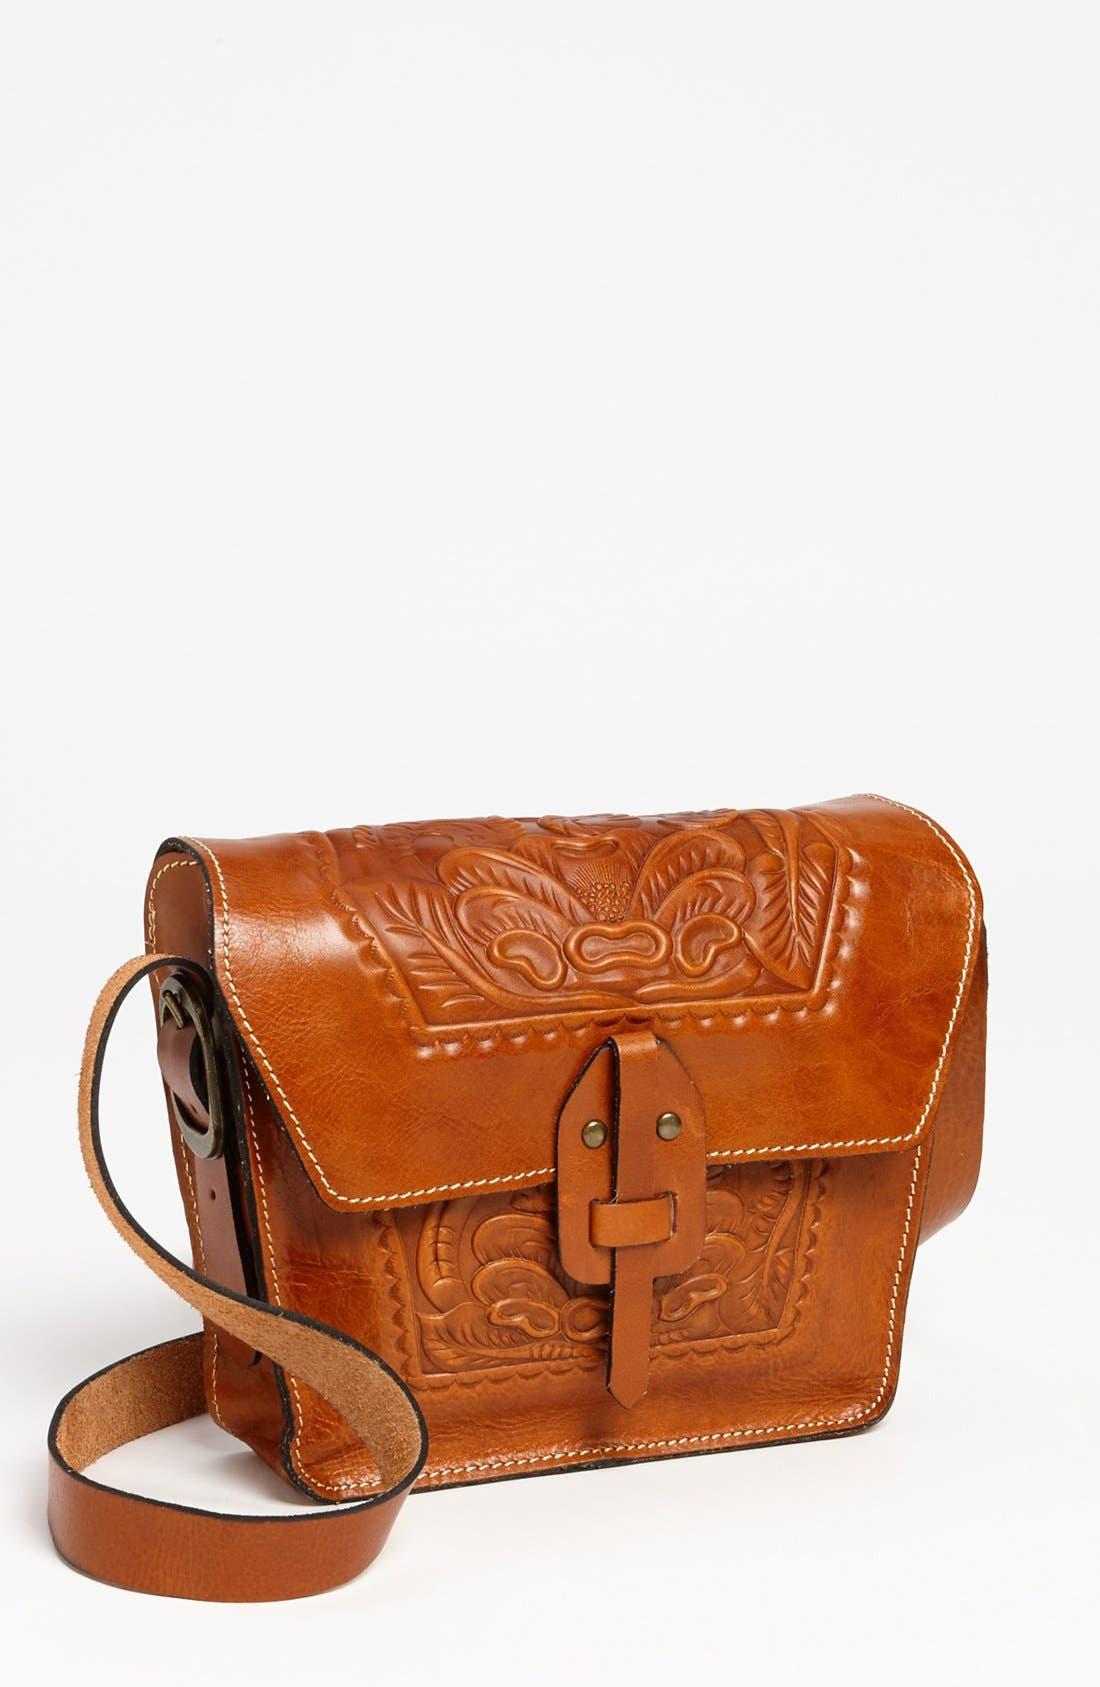 Main Image - Patricia Nash 'Marciano' Leather Crossbody Bag